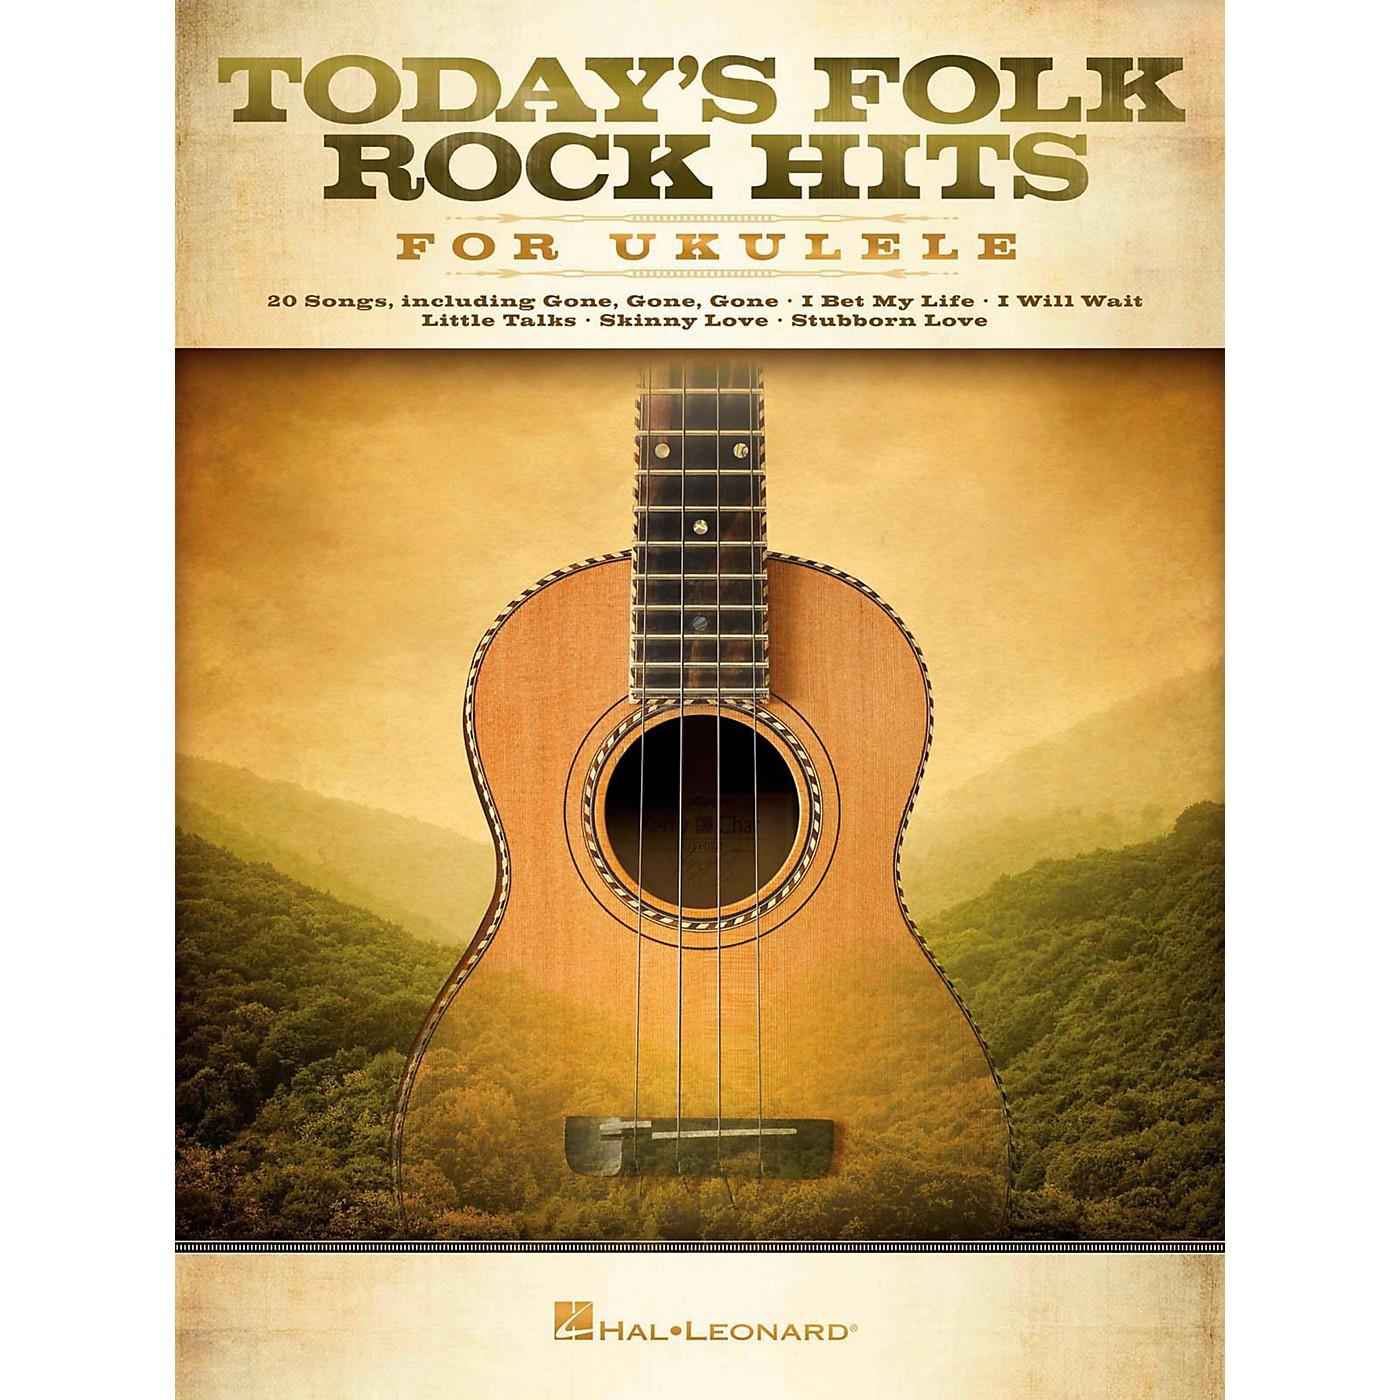 Hal Leonard Today's Folk Rock Hits For Ukulele thumbnail